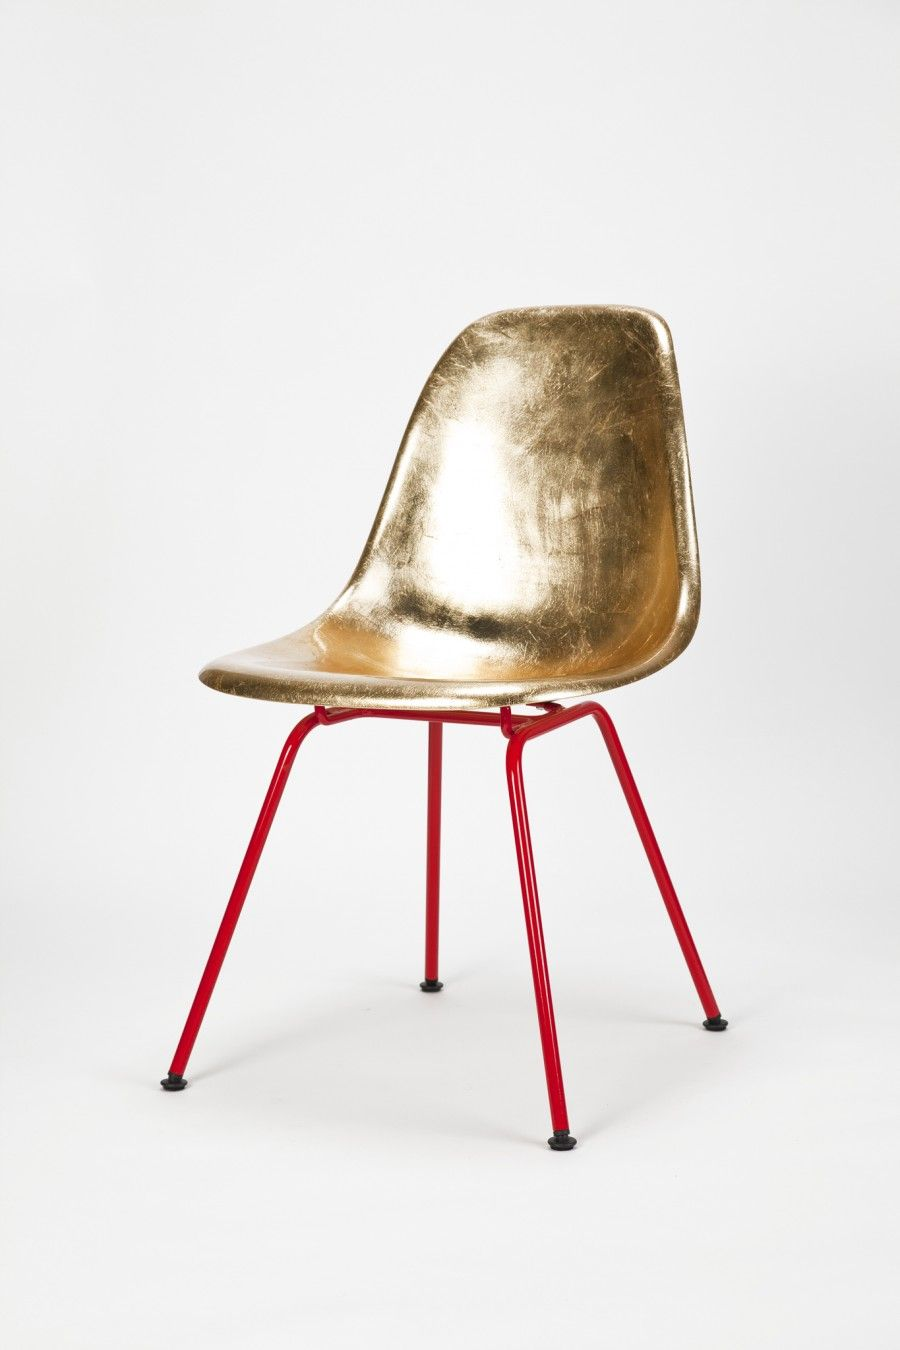 Eames Side Chair Golden By Charles Ray Eames Reha Okay Mobilier De Salon Casa Deco Deco Design